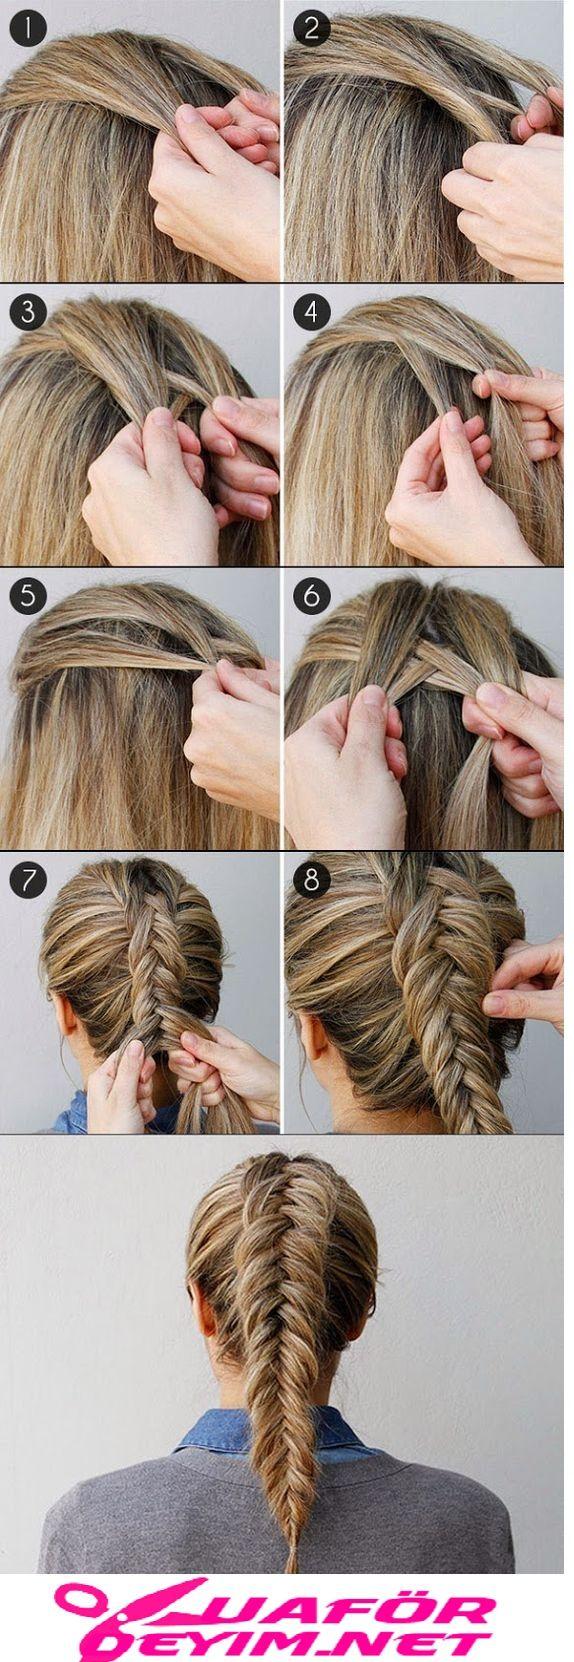 Quick And Easy Braid Hair Tutorial Braided Hairstyles Easy Hair